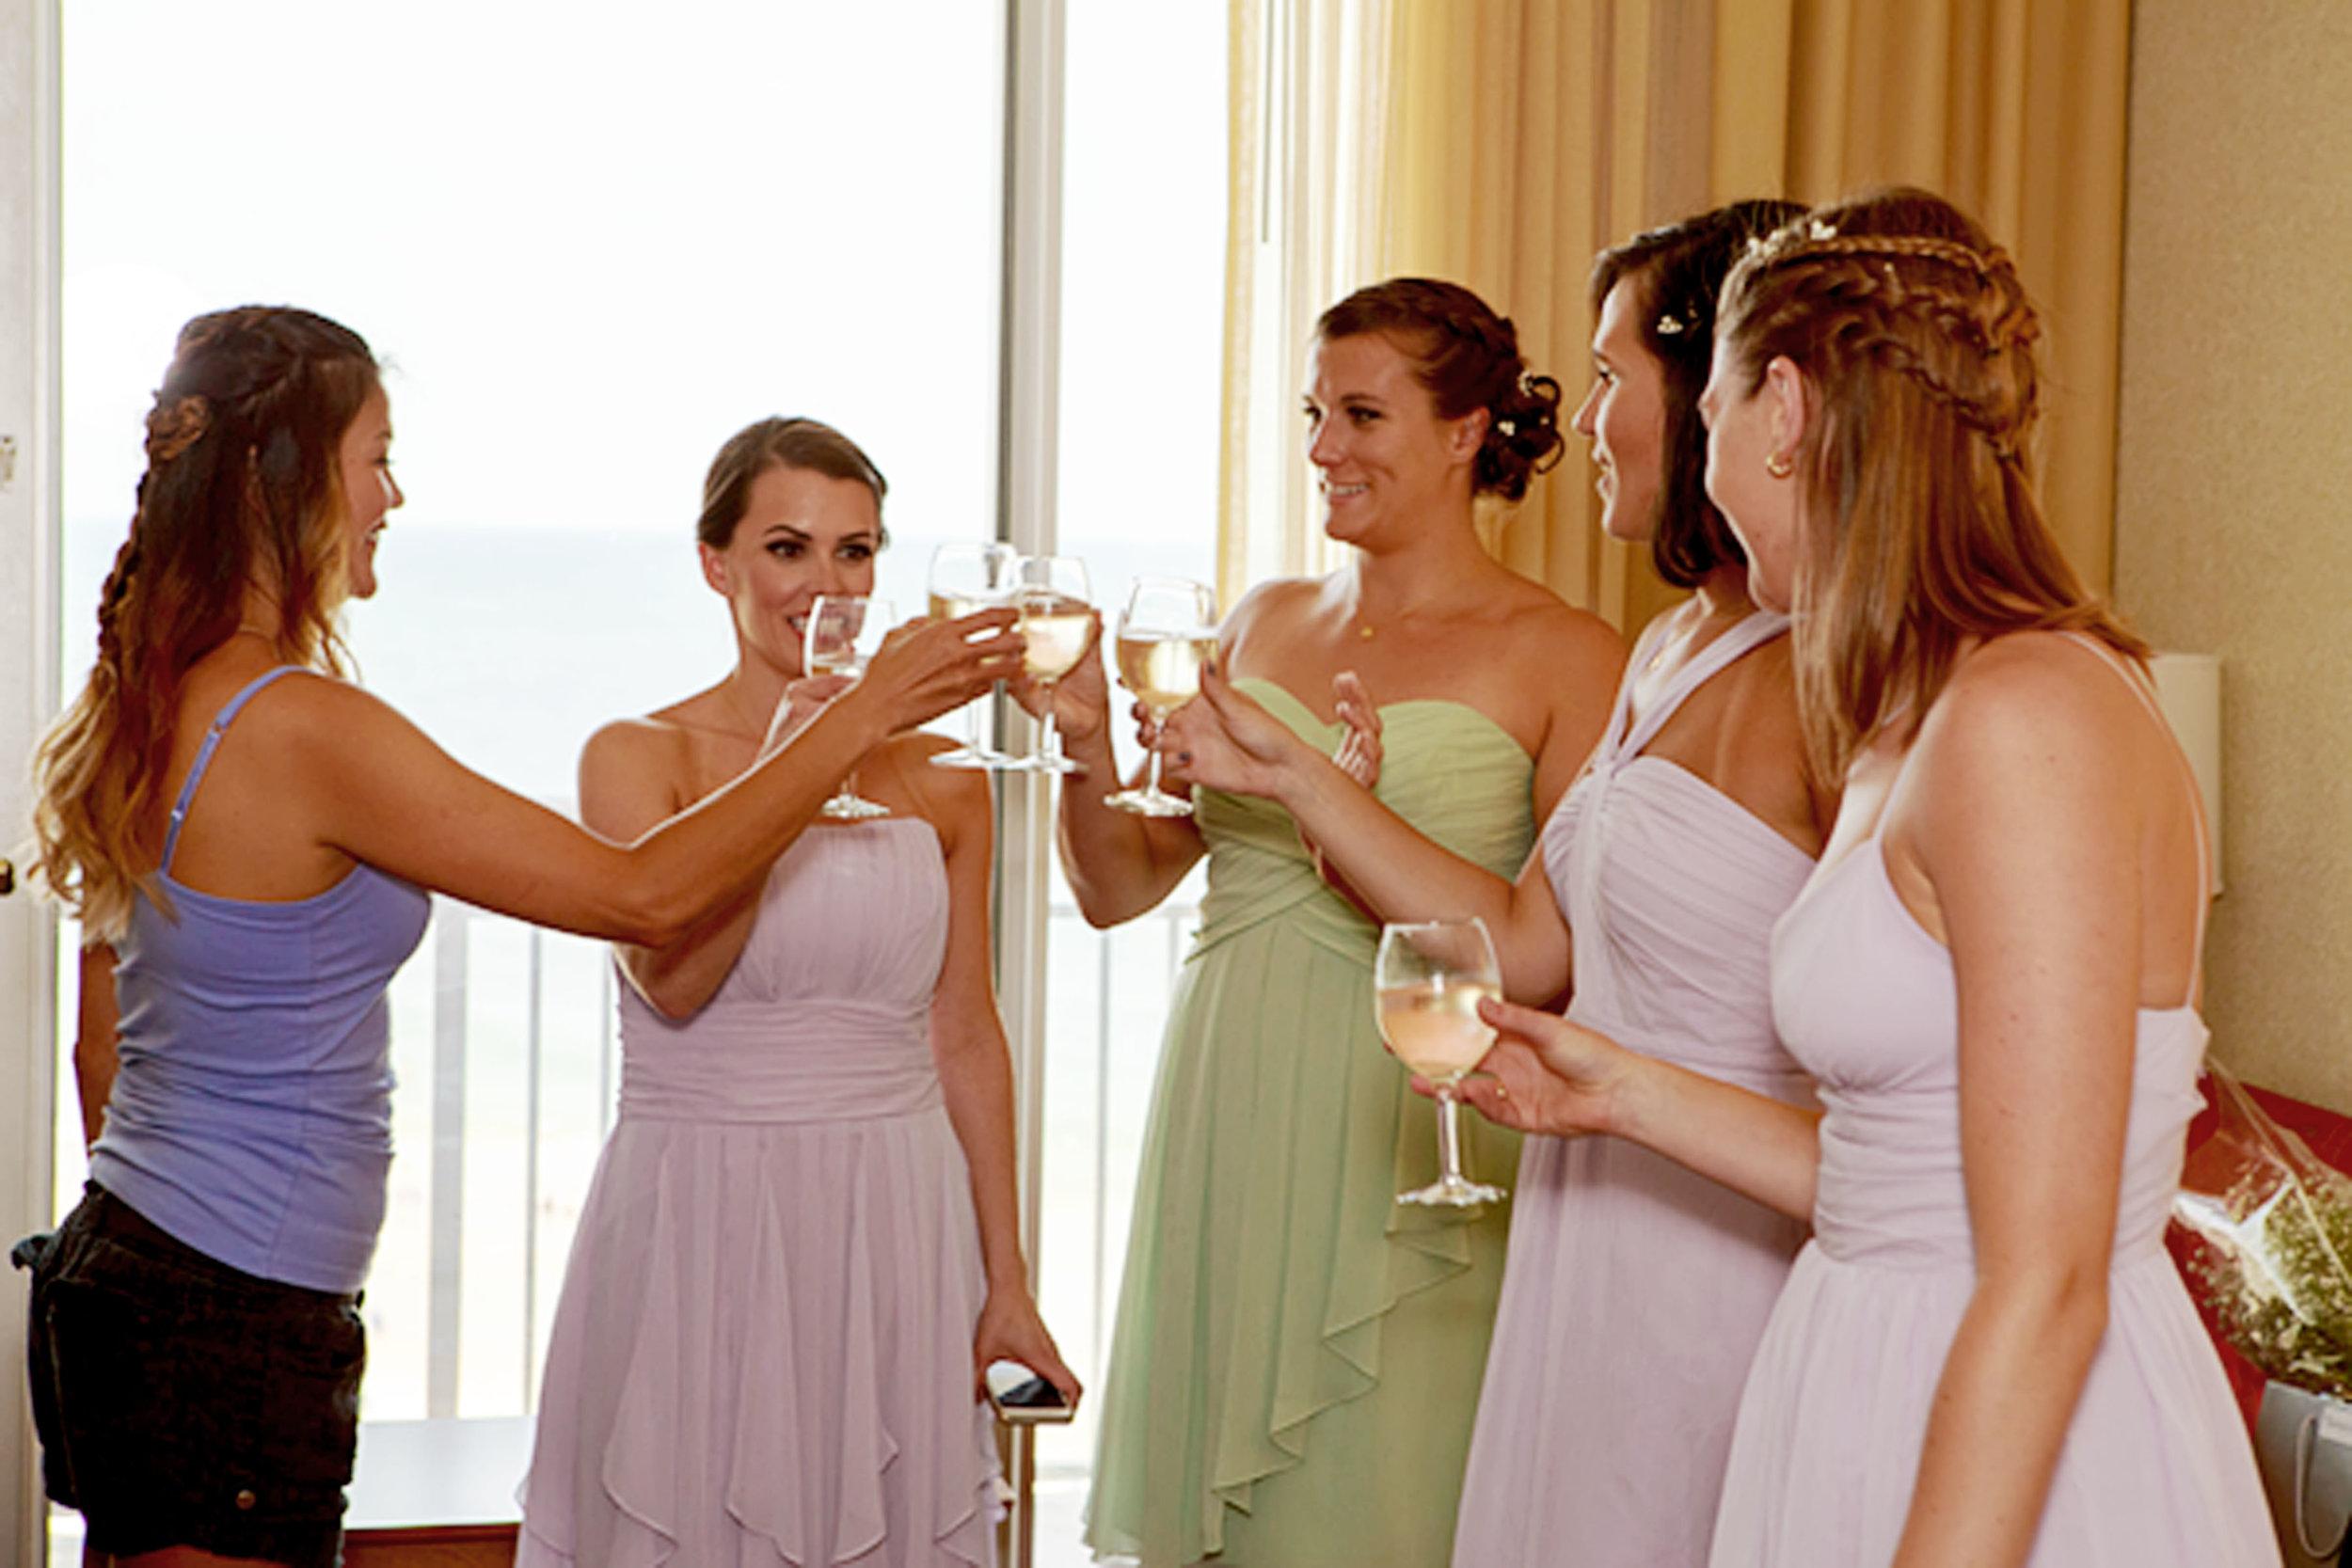 North_Carolina_Wedding_Photographer_Tiffany_Abruzzo_Girls_46.jpg